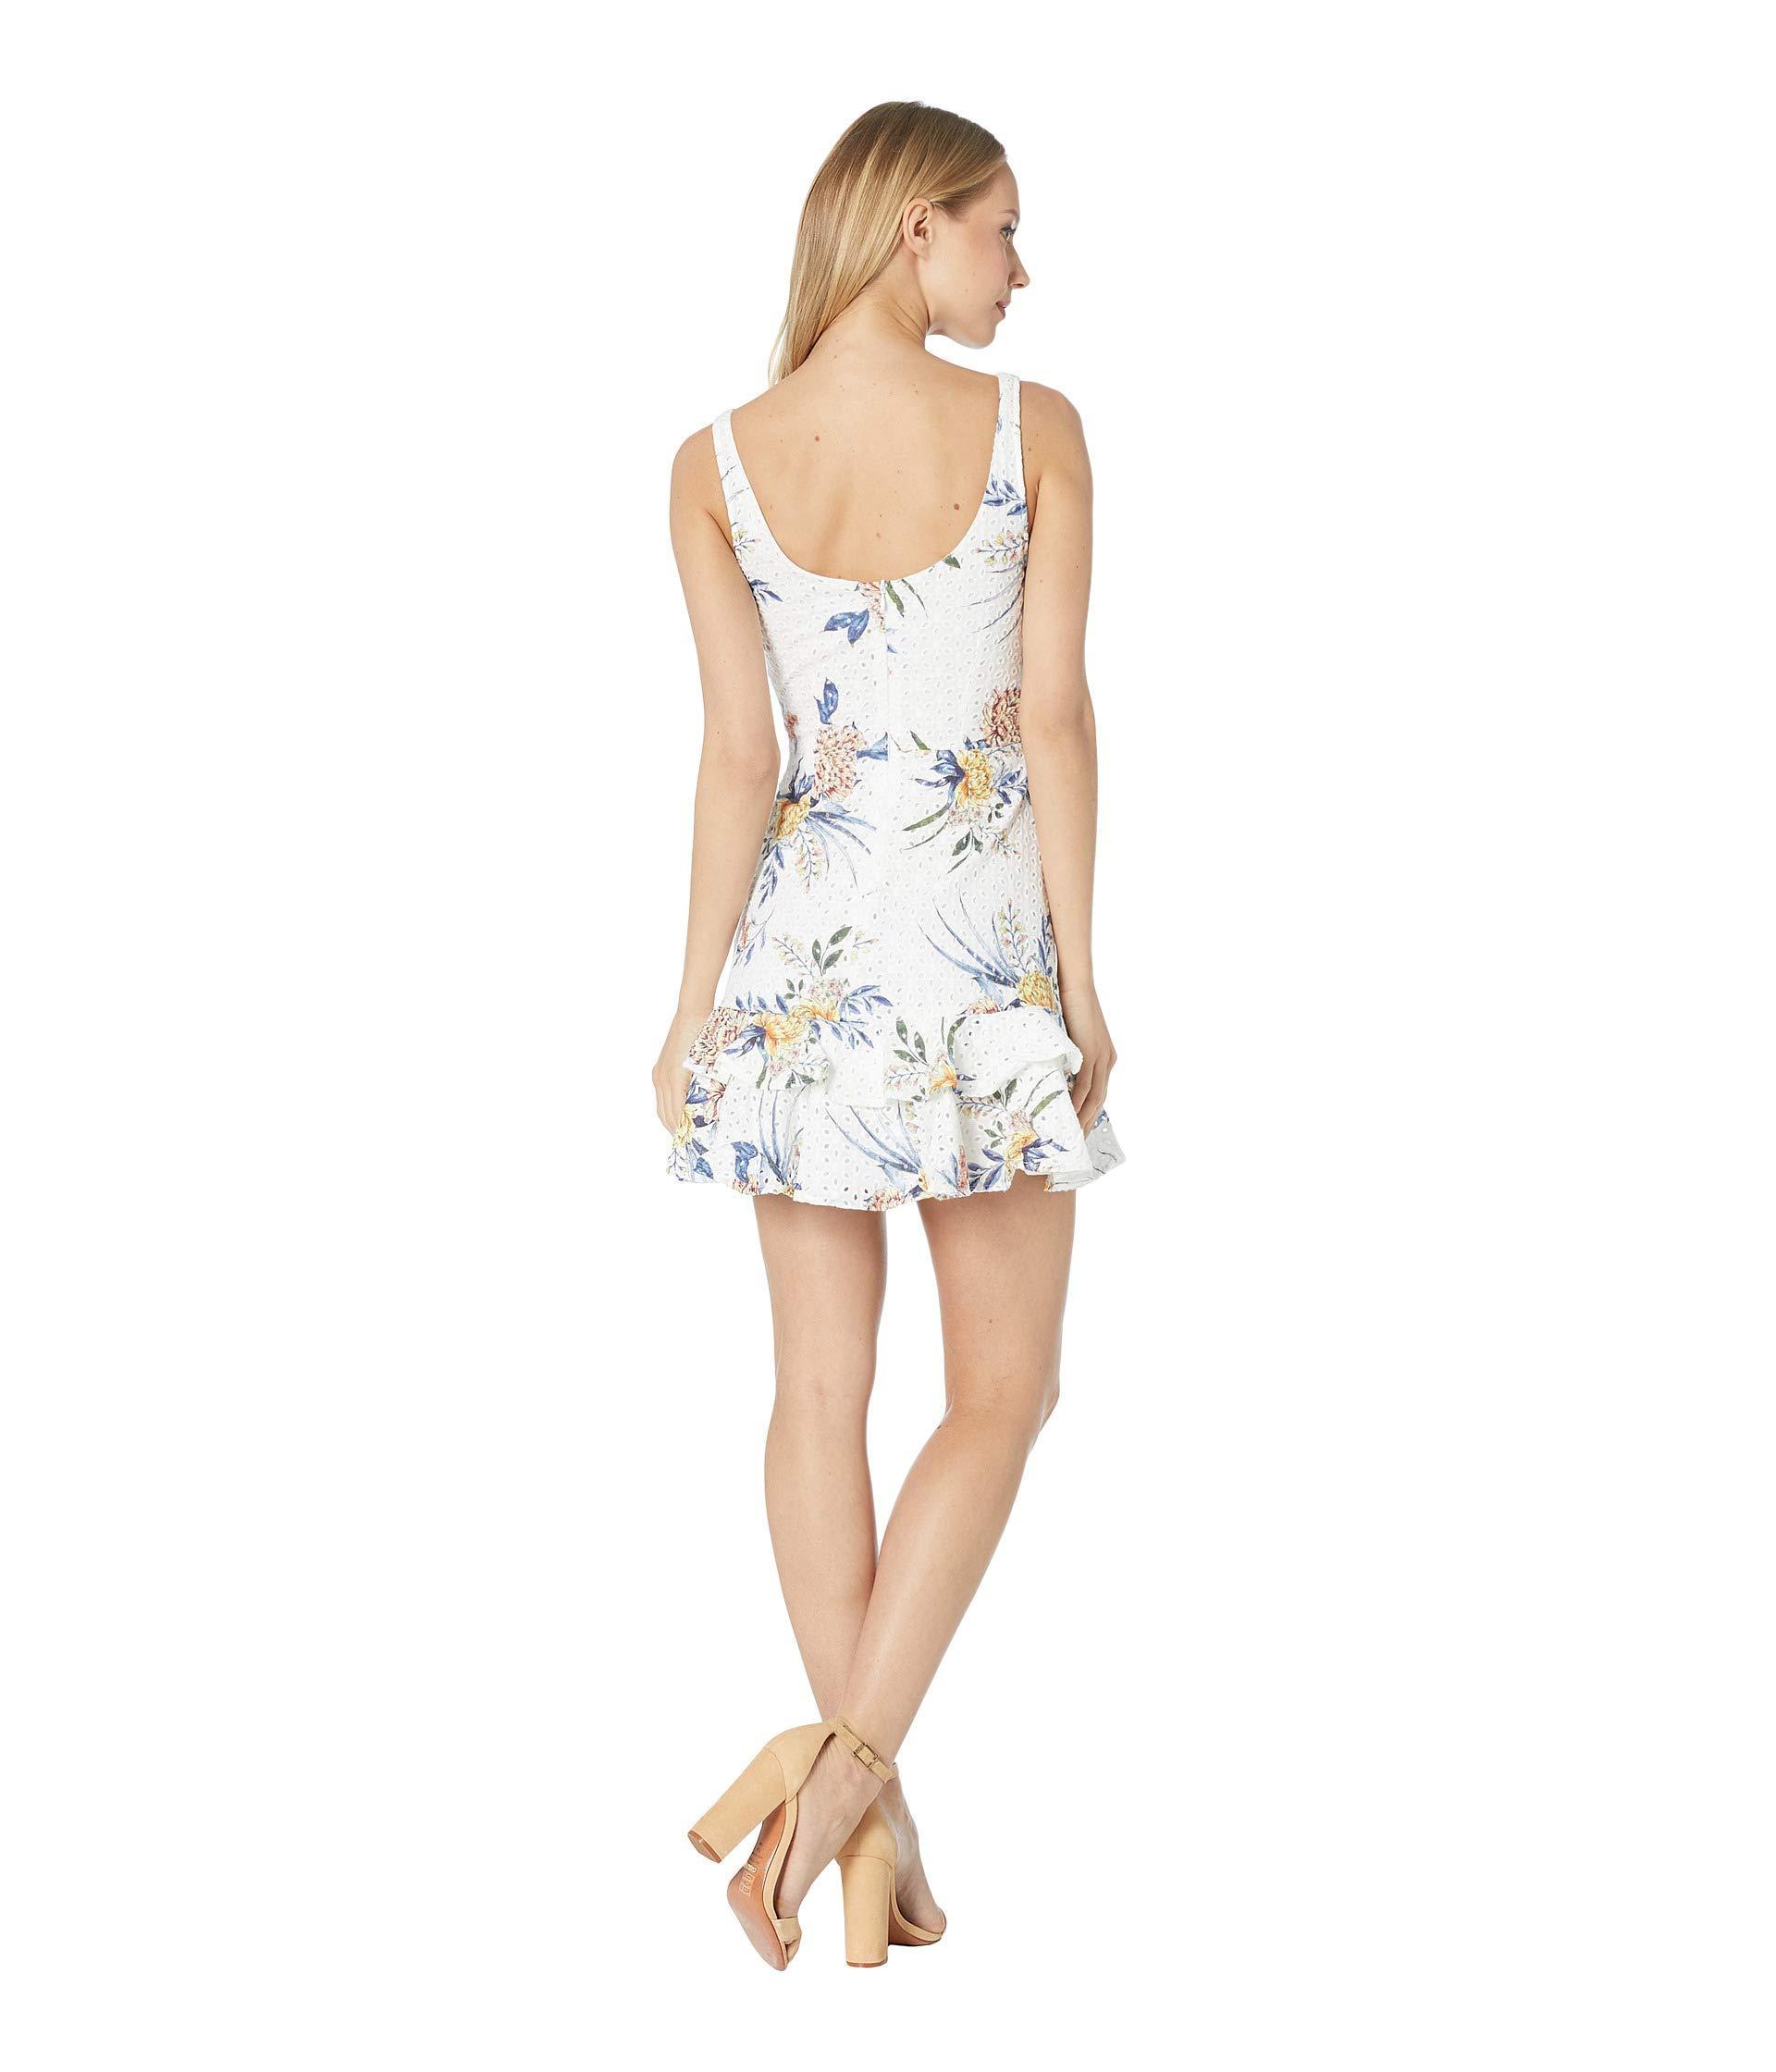 21664af9c44 BB Dakota - Turn Up The Heat Dress (optic White) Women s Dress - Lyst. View  fullscreen